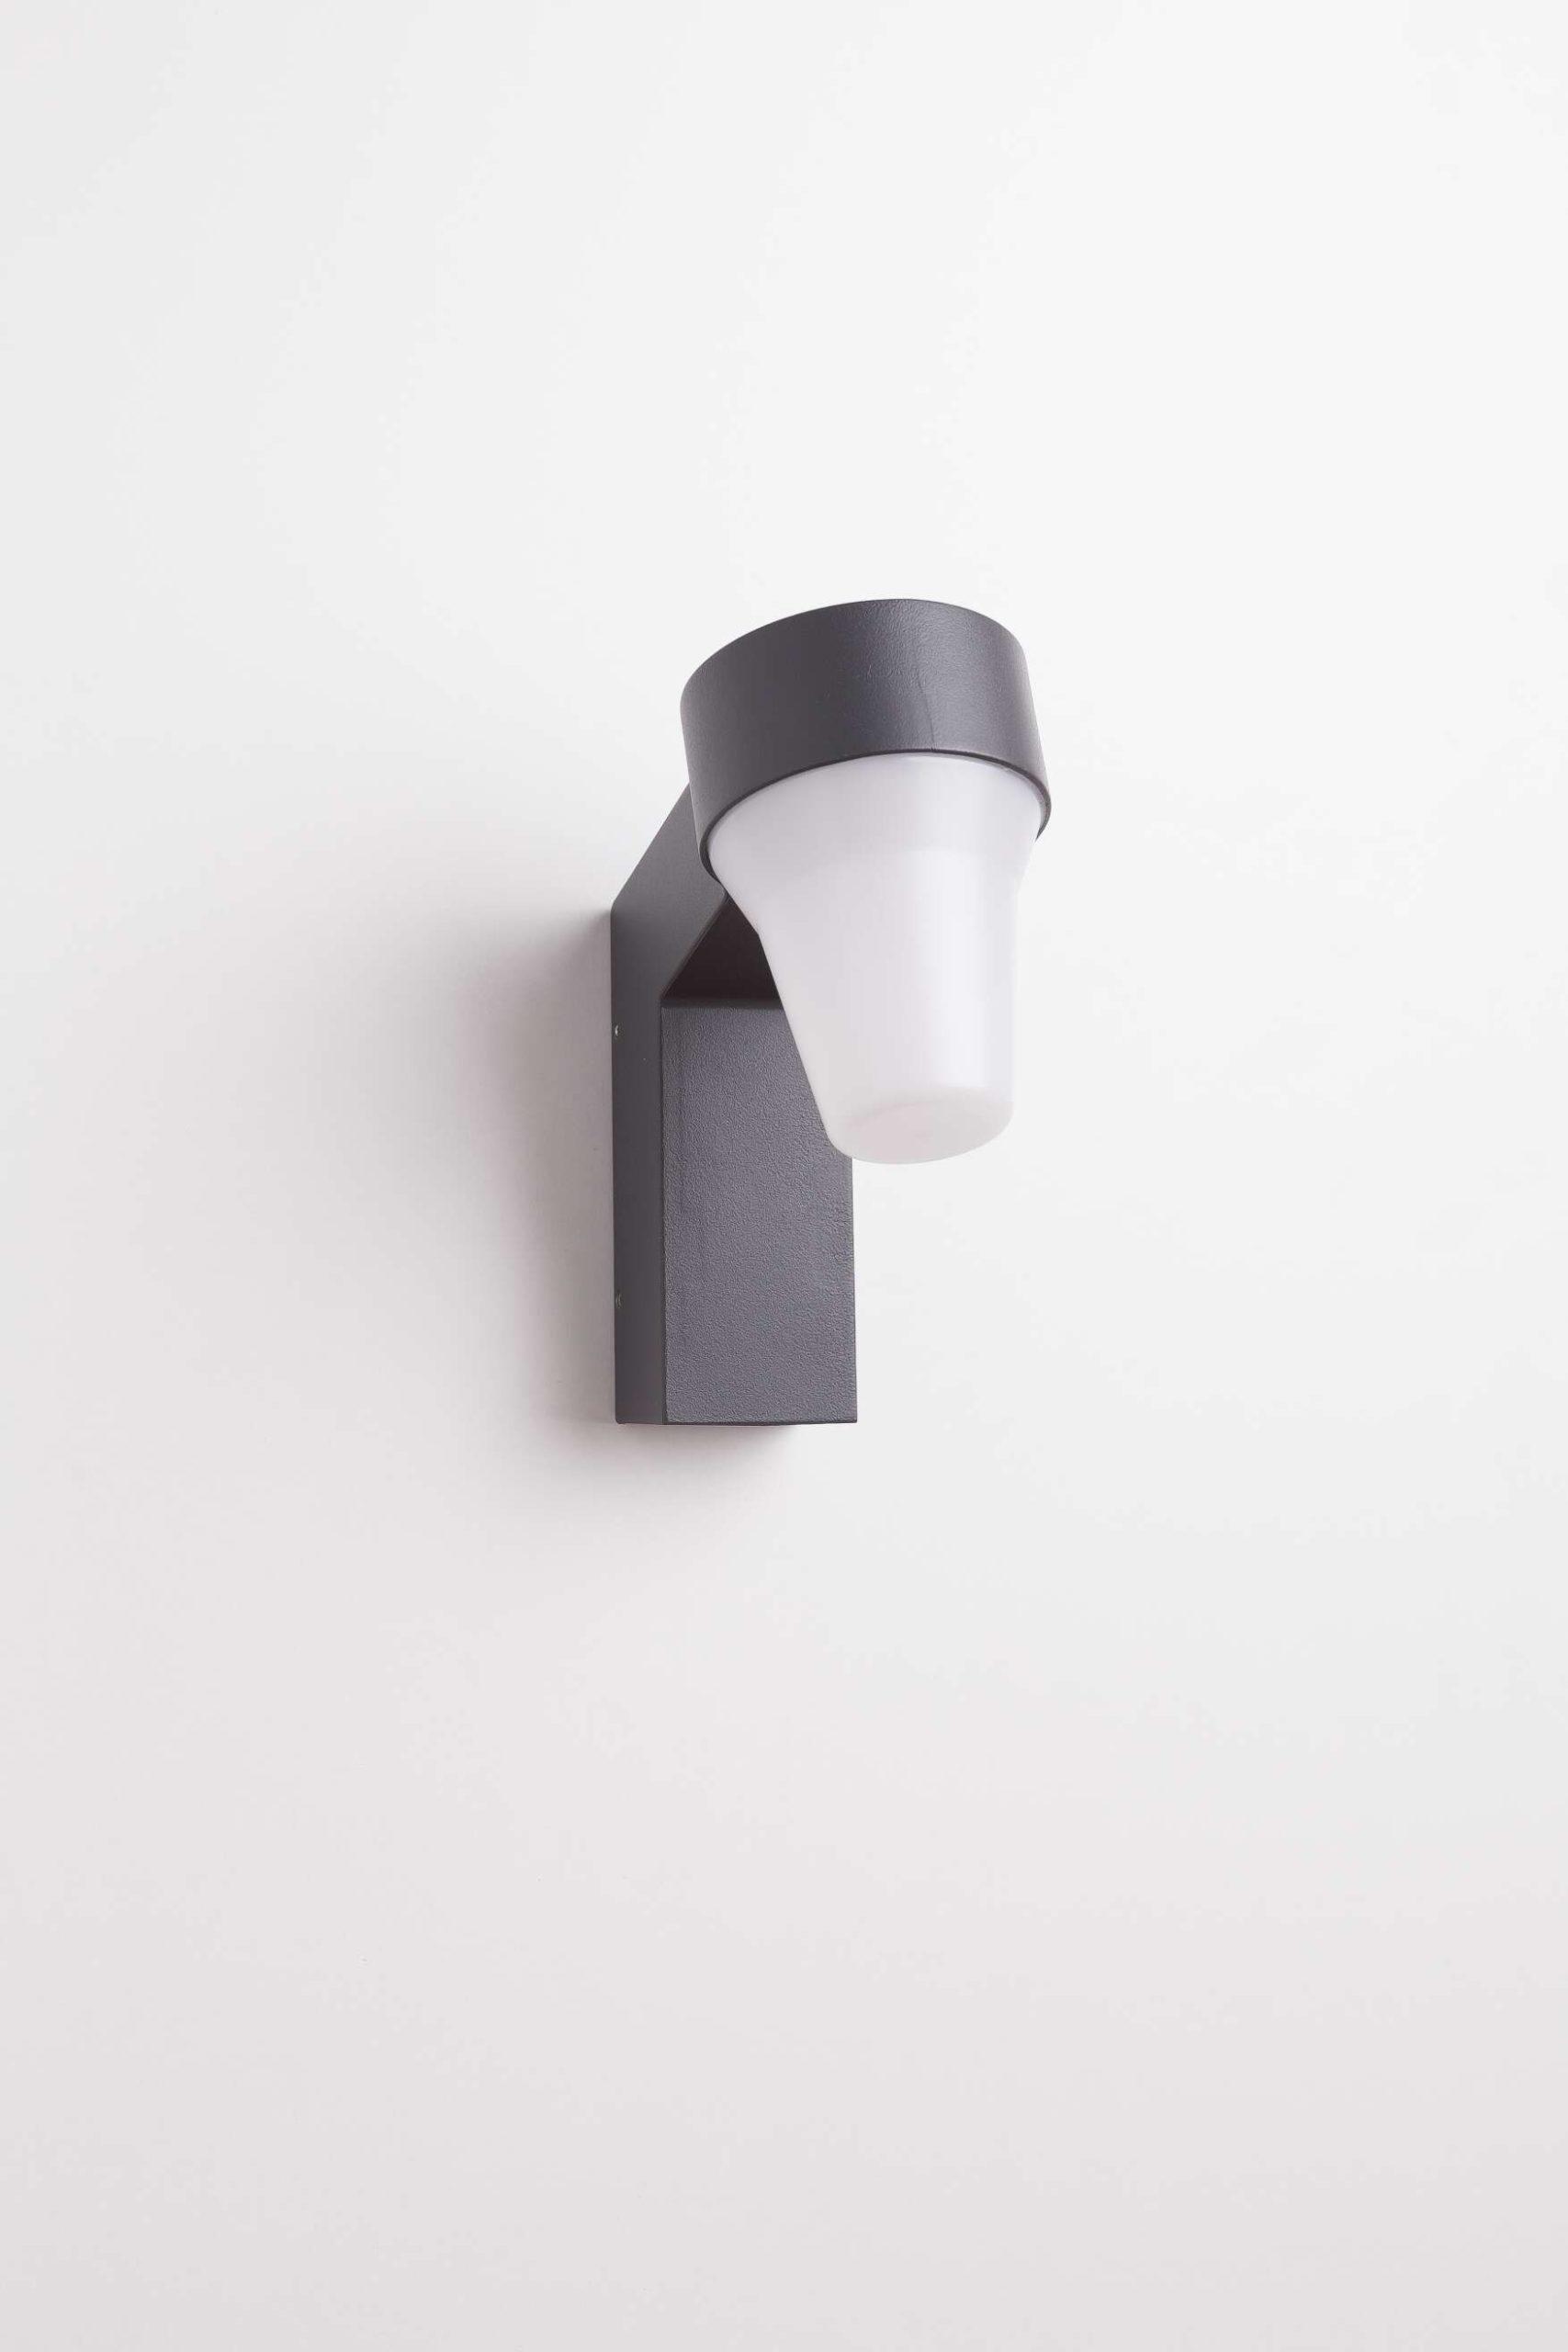 ELBOW Outdoor Lighting by ALOS. Product Design Studio.